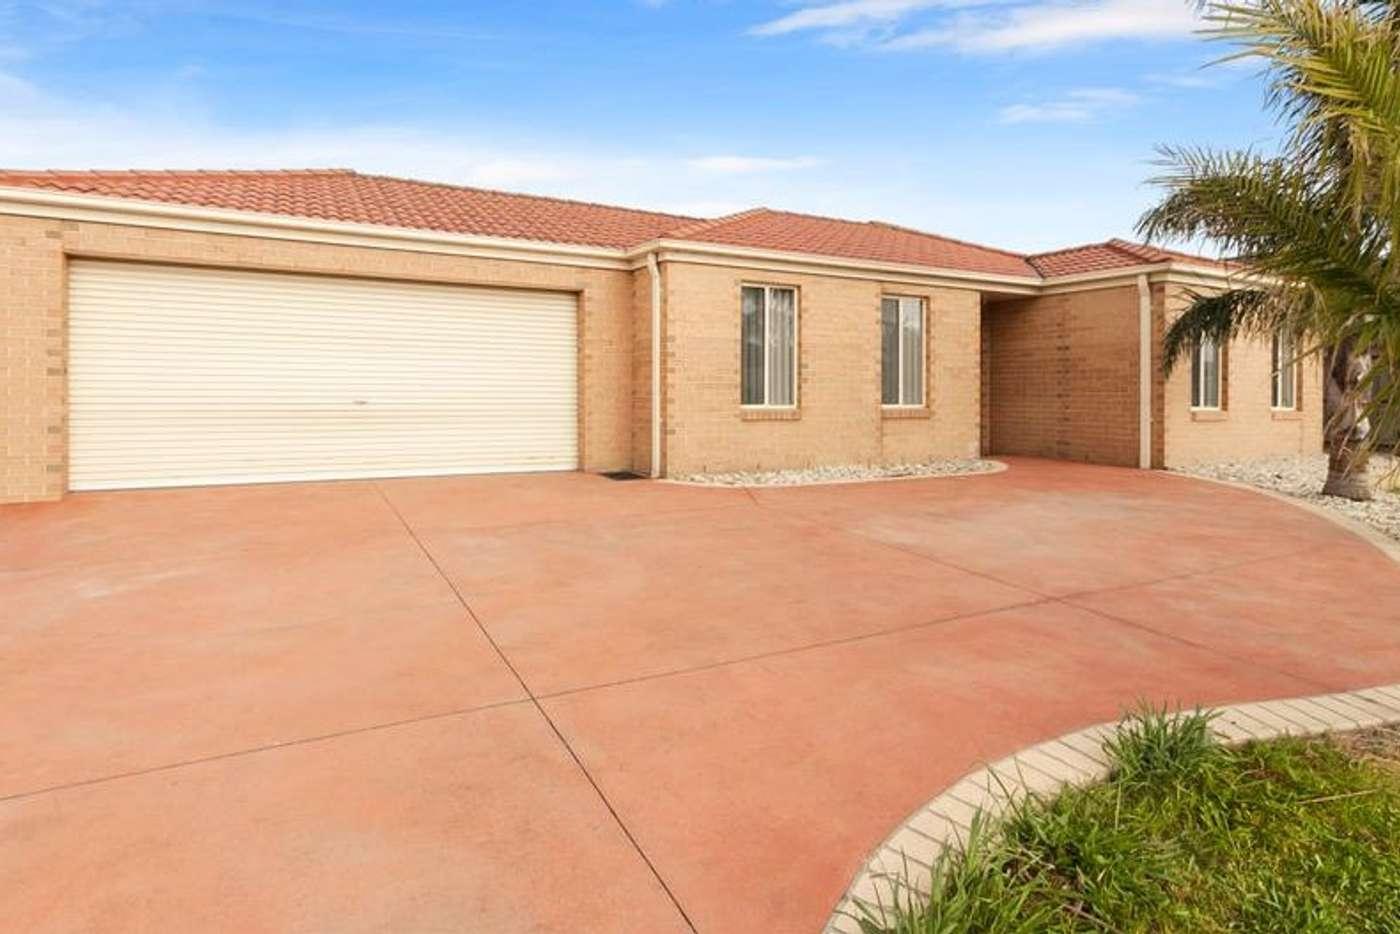 Main view of Homely house listing, 16 Greendale Boulevard, Pakenham VIC 3810